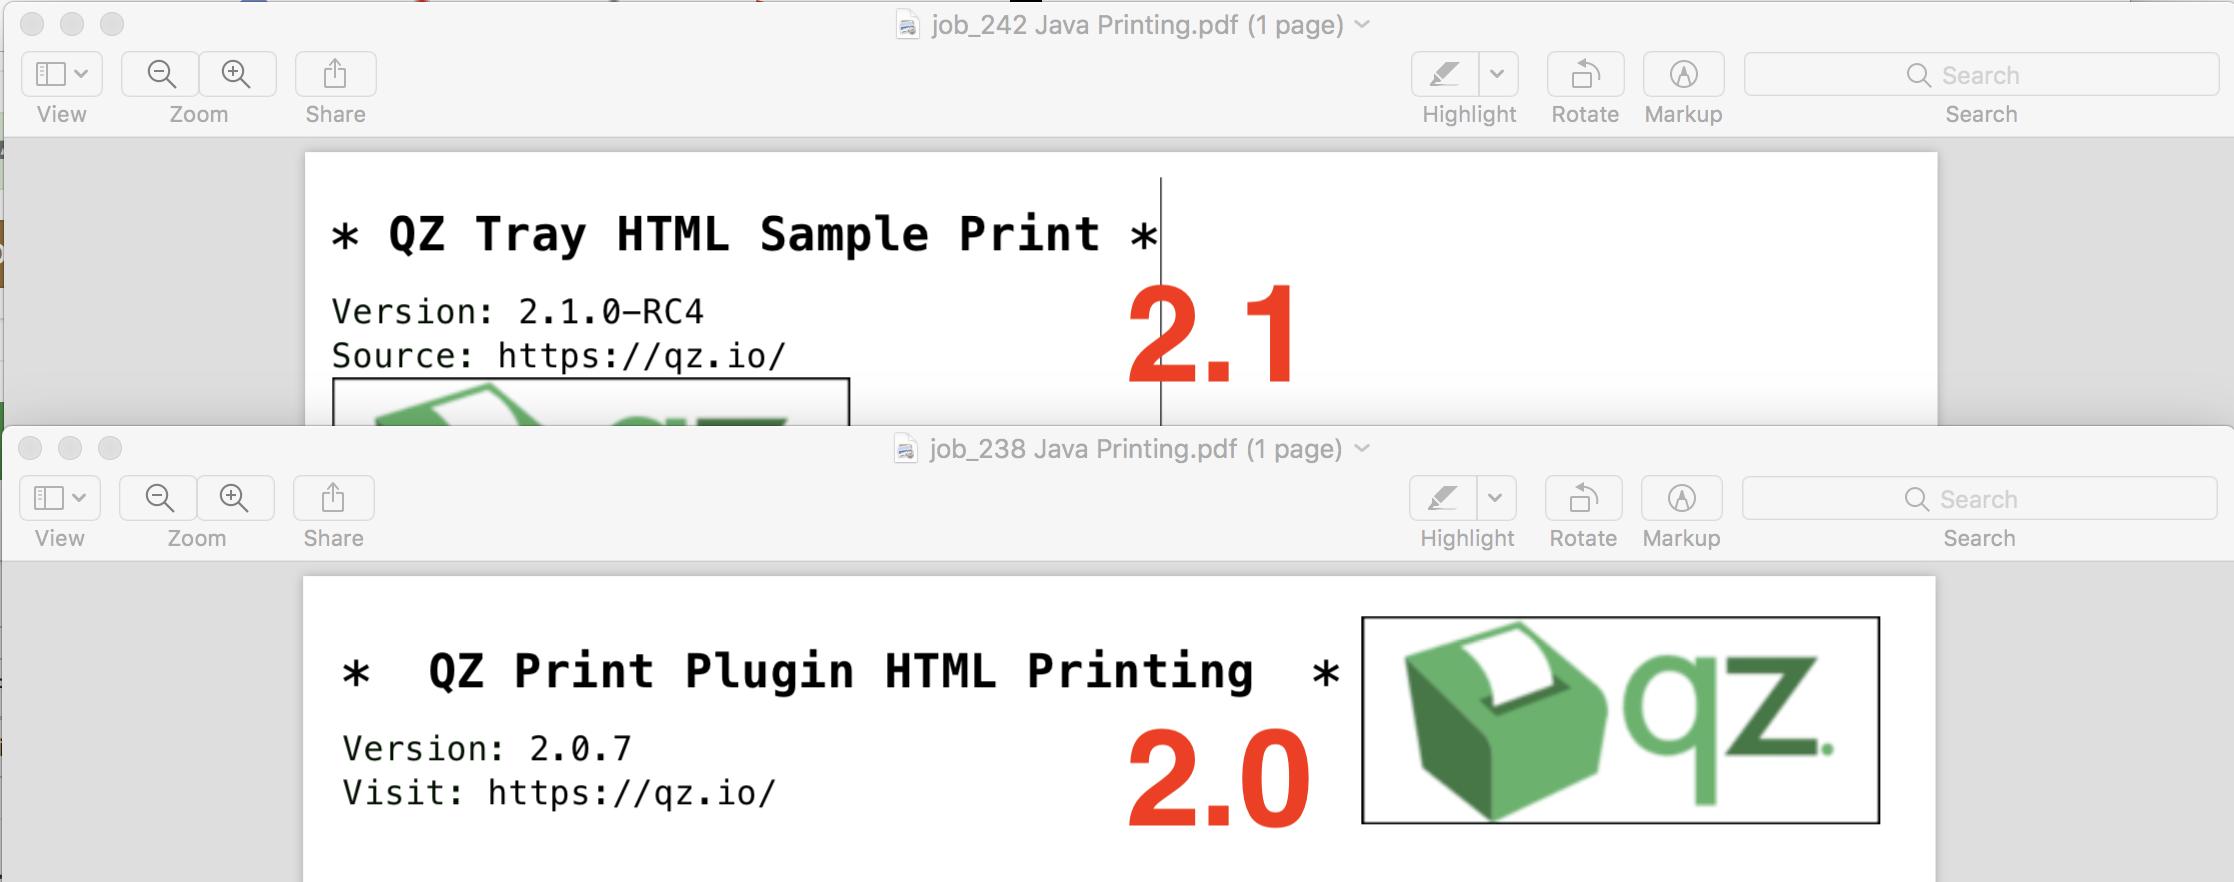 2 1 vs 2 0 Legacy HTML Printing · Issue #307 · qzind/tray